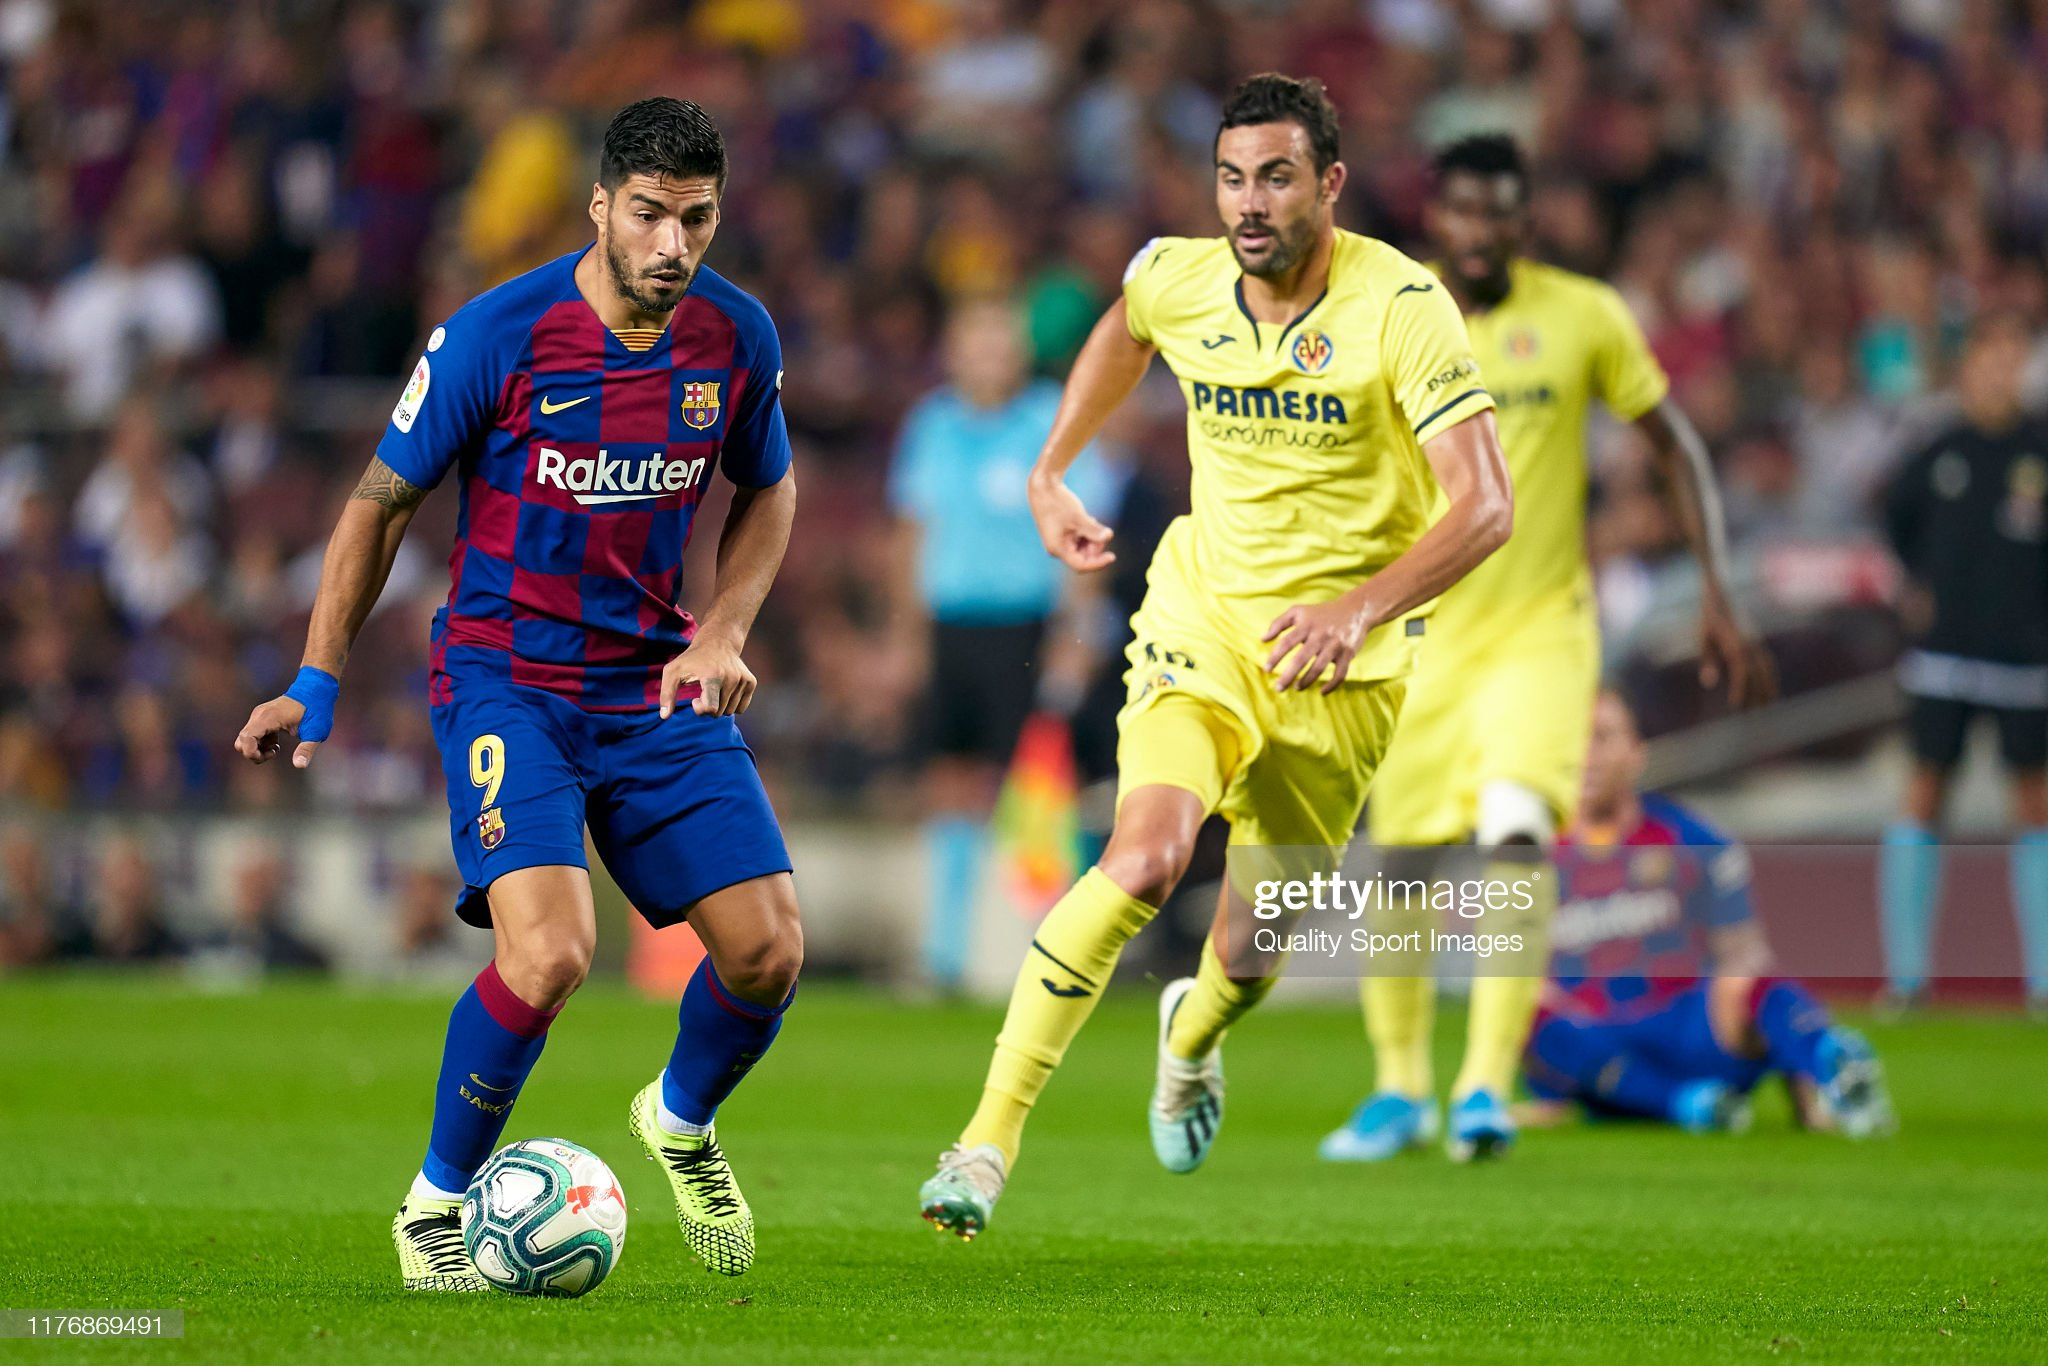 صور مباراة : برشلونة - فياريال 2-1 ( 24-09-2019 )  Luis-suarez-of-fc-barcelona-competes-for-the-ball-with-vicente-iborra-picture-id1176869491?s=2048x2048